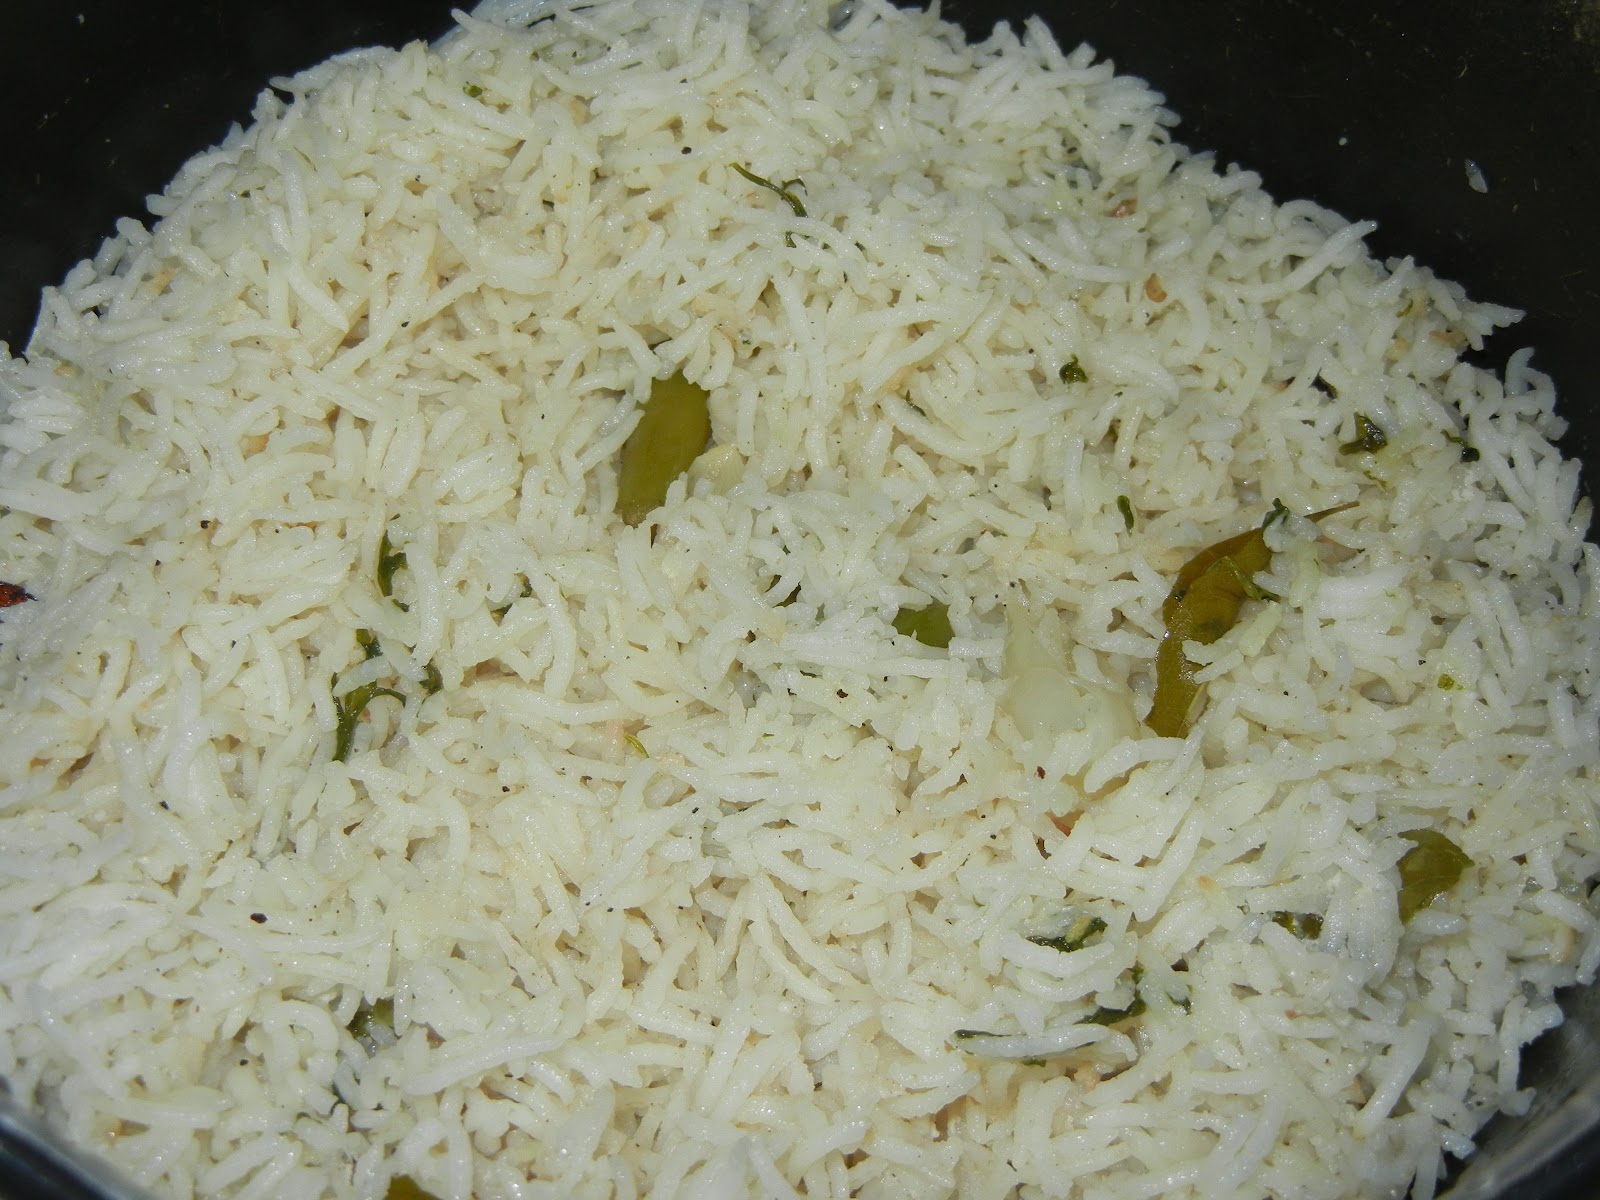 Yashodha's kitchen: COCONUT MILK RICE / THENGAI PAAL SADHAM